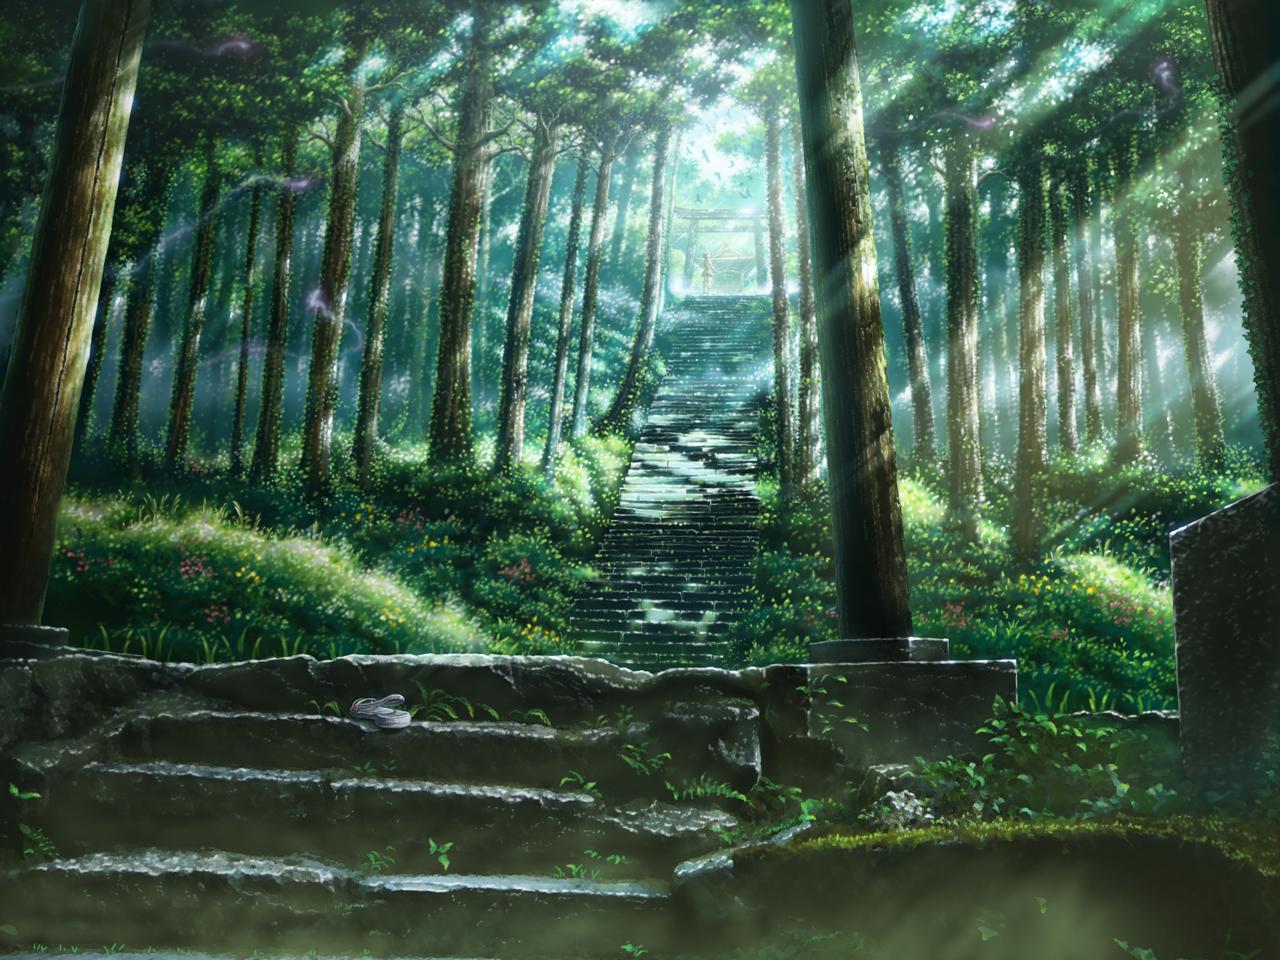 Anime Landscape Outdoor Anime Landscape 1280x960